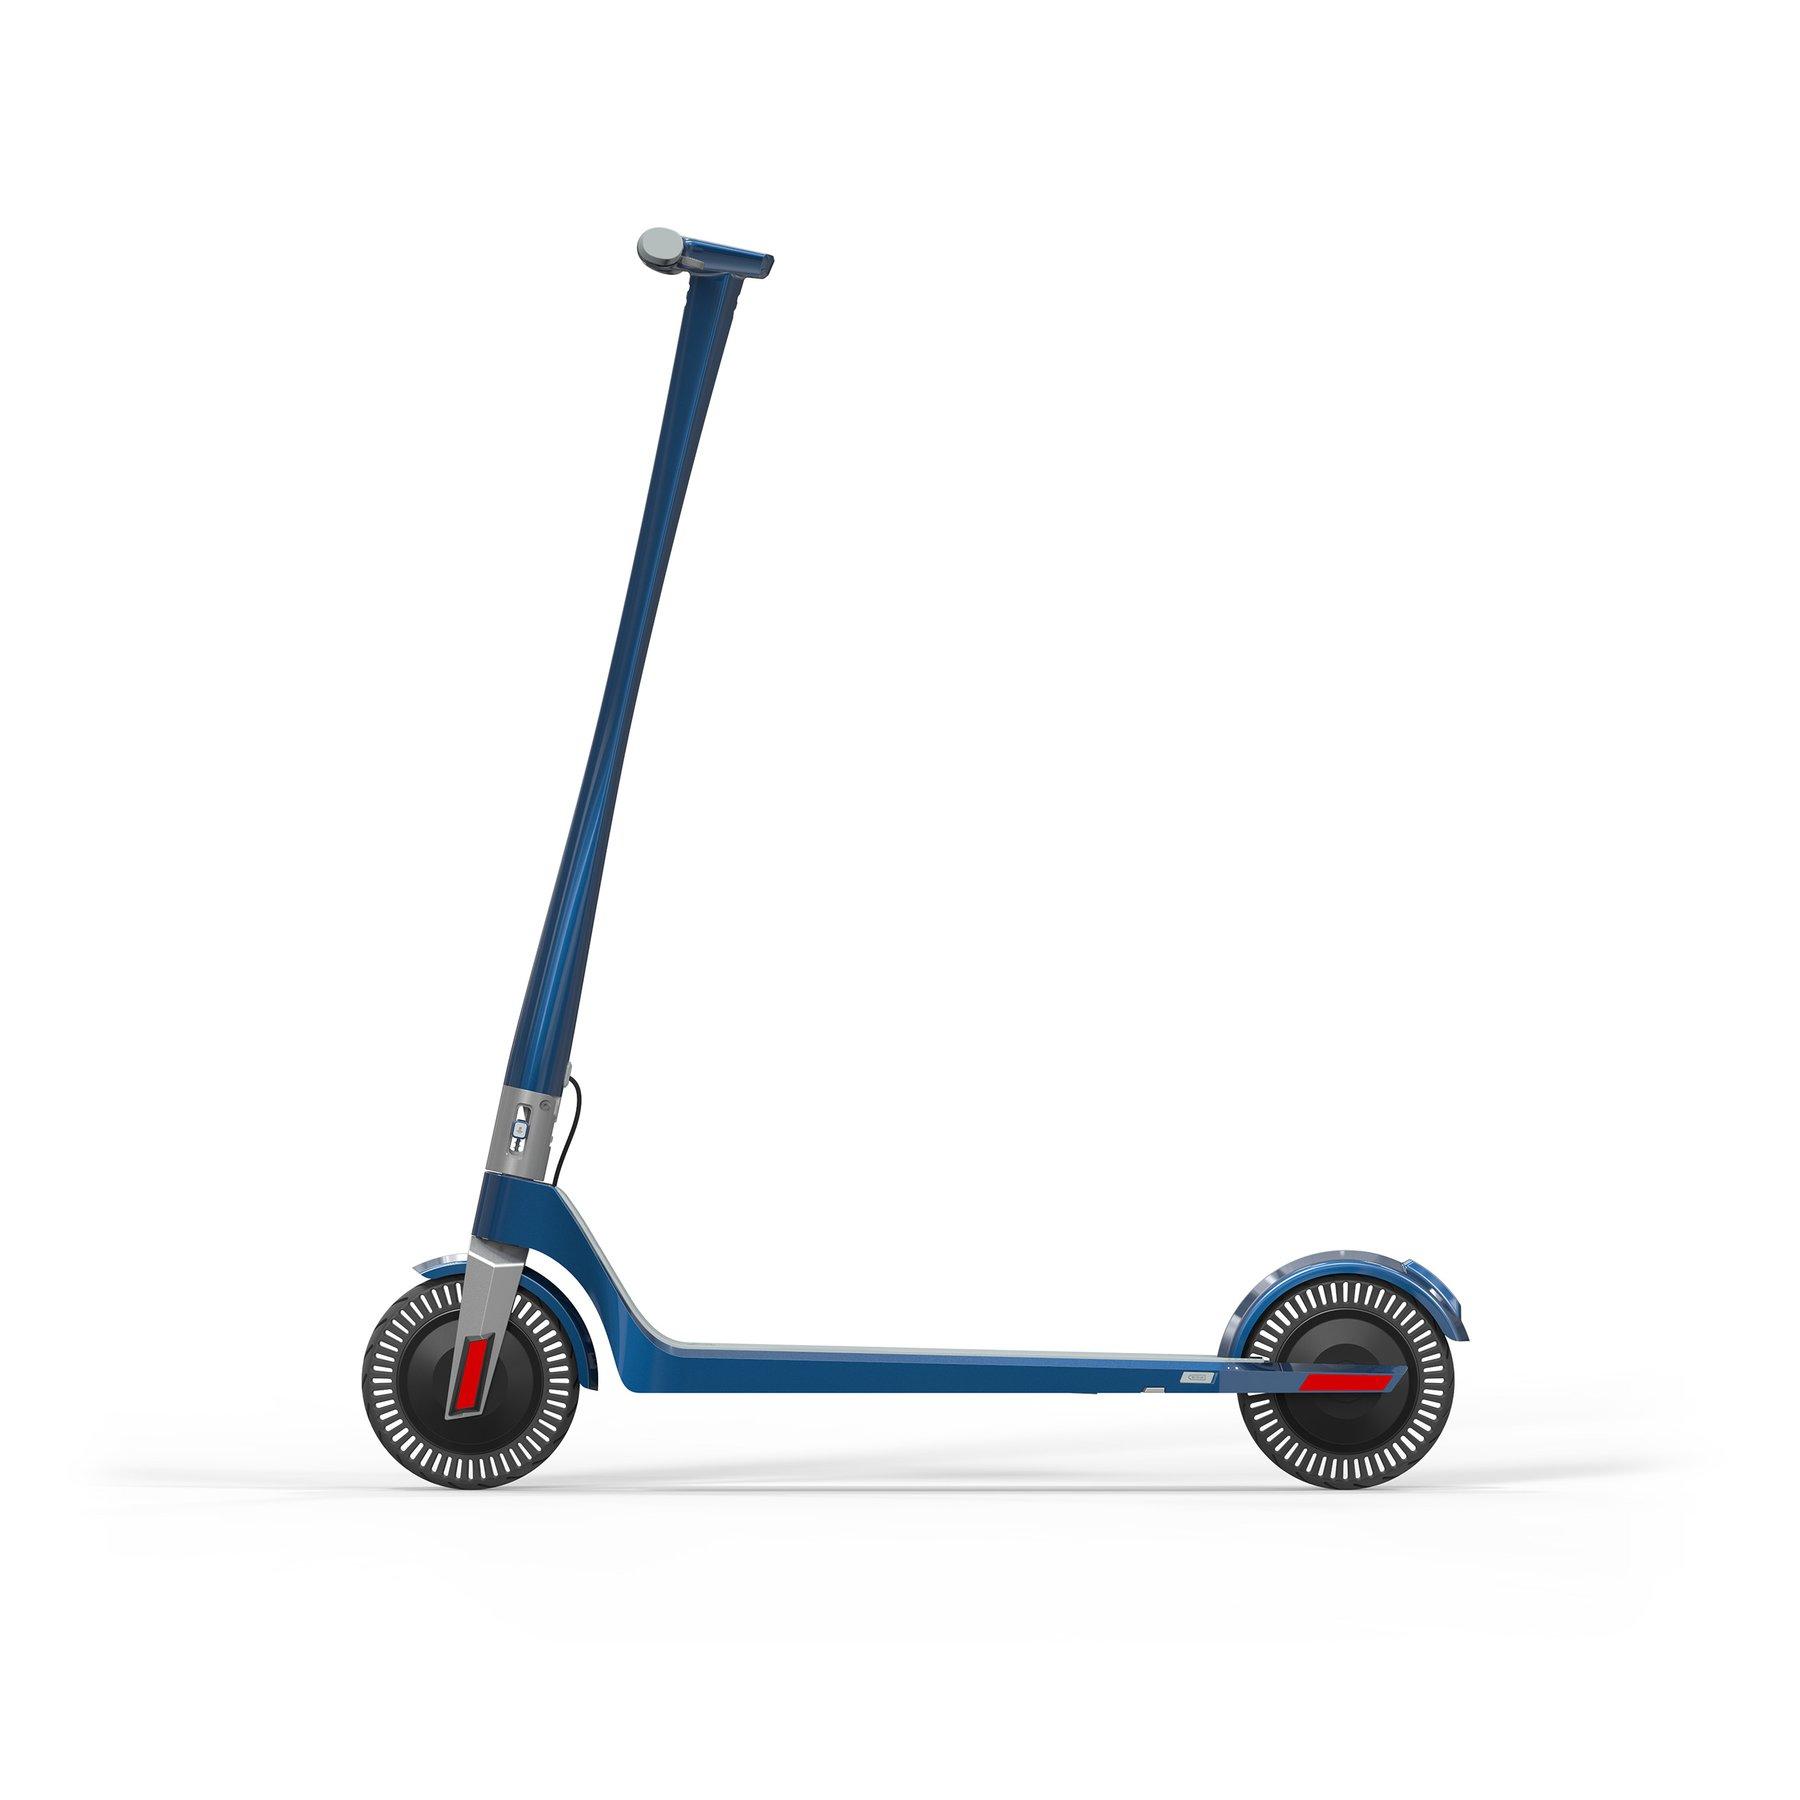 scooter_cosmic_blue_01_1800x1800.jpg